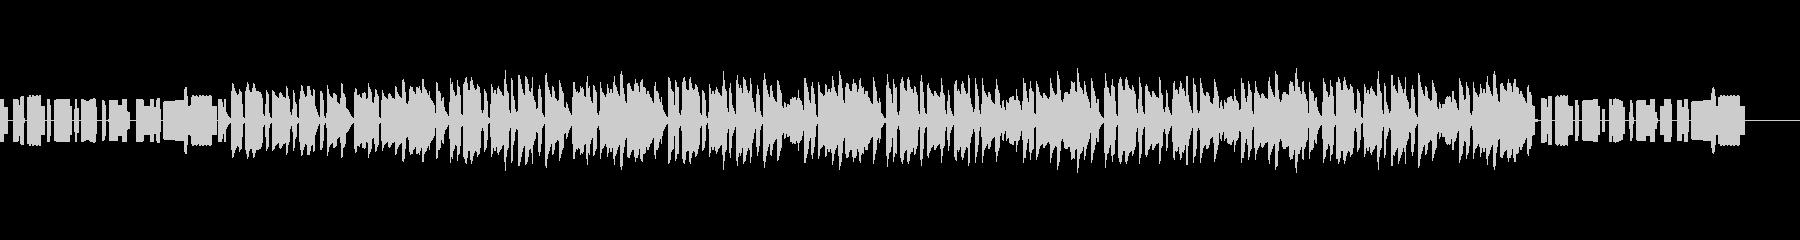 bpm64 上手な演奏バージョンの未再生の波形